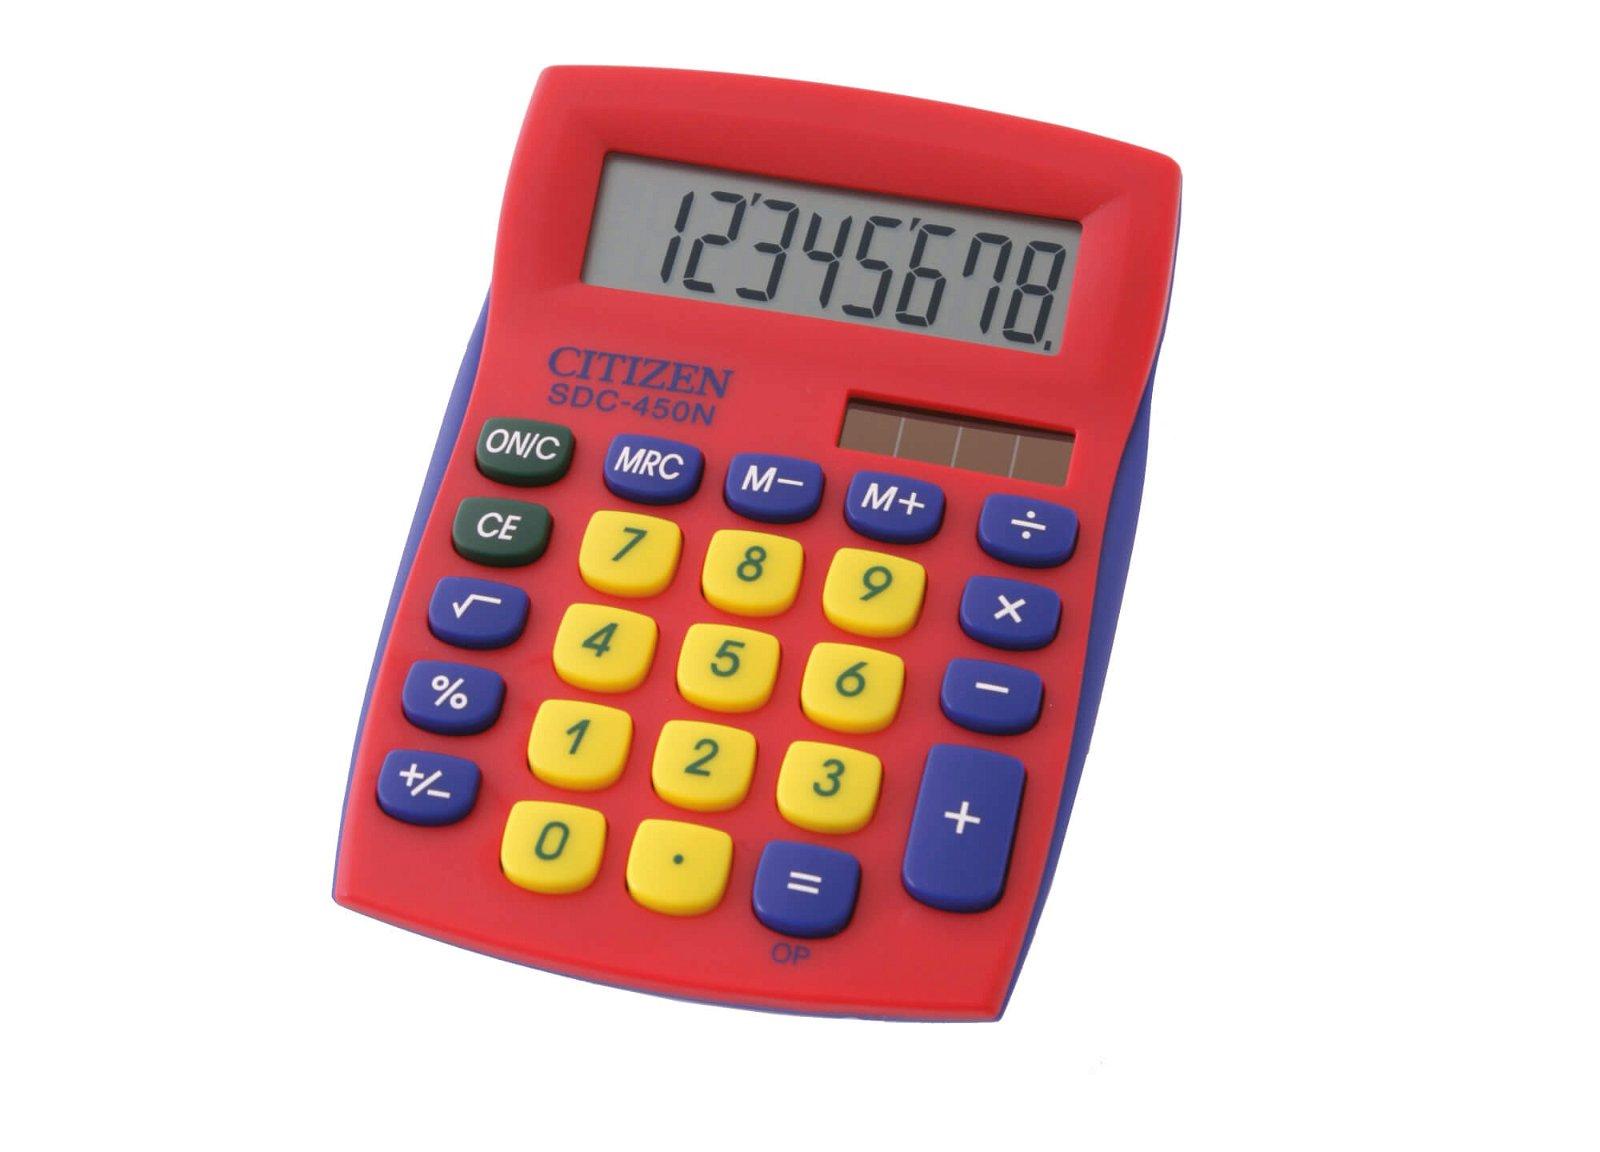 Tischrechner SDC 450NRDCFS semi, rot